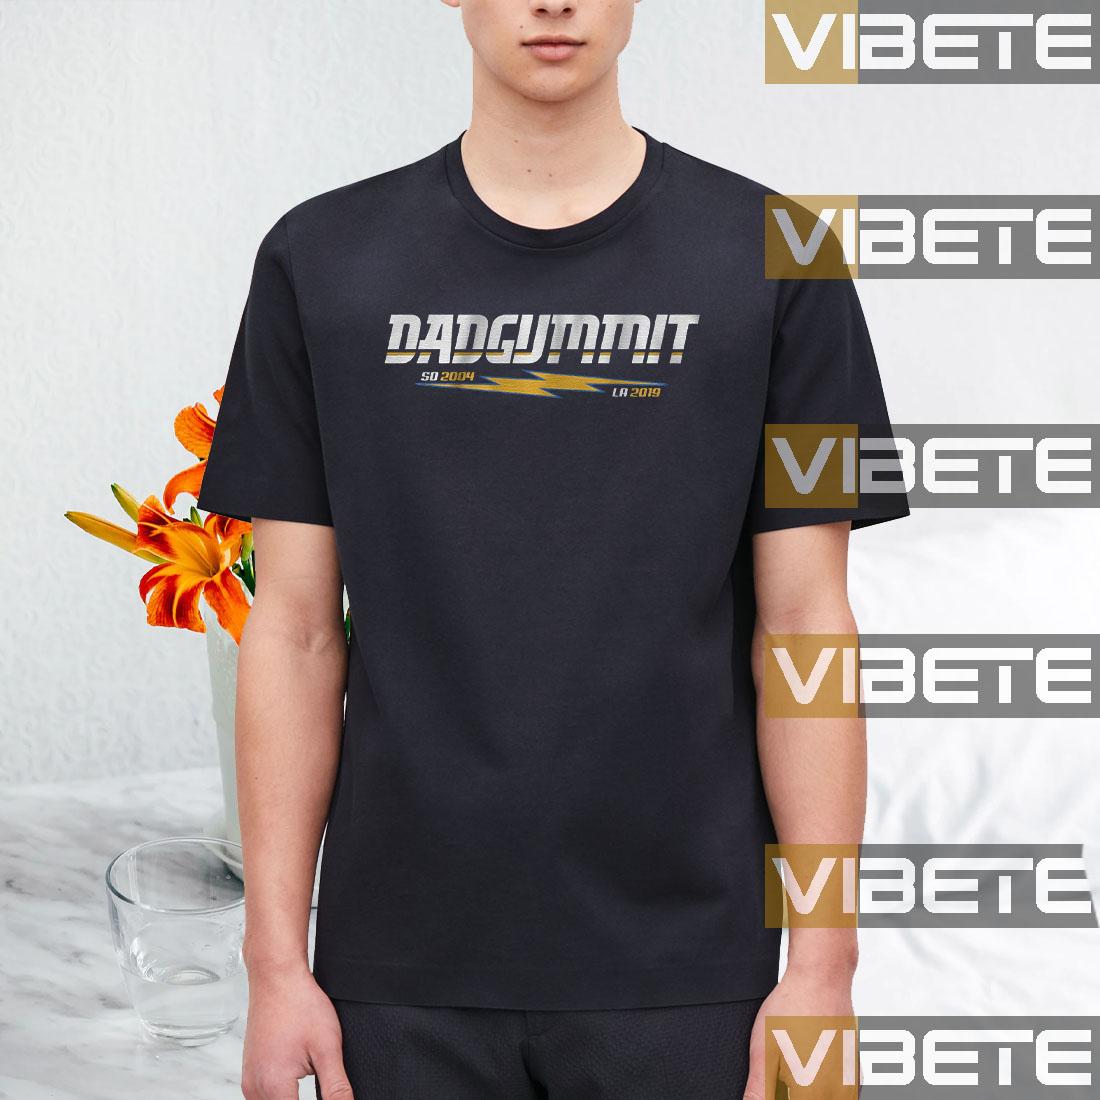 Dadgummit San Diego and Los Angeles Football T-Shirt